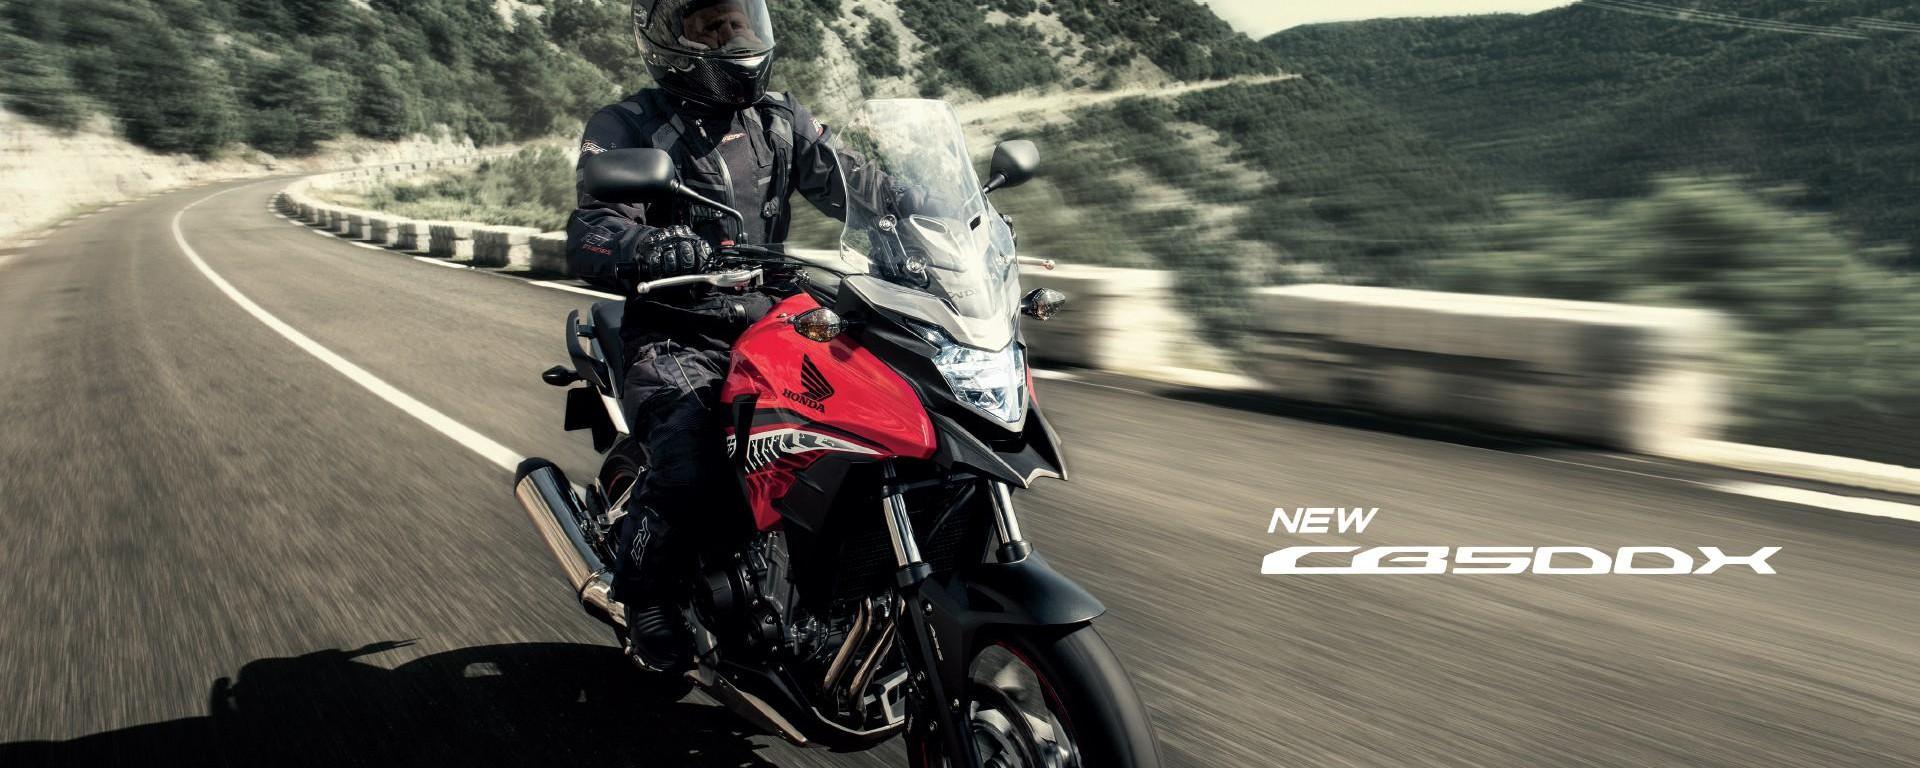 Honda-bigbike-Motorcycle-มอเตอร์ไซค์-บิ๊กไบค์-ฮอนด้า-CB500X